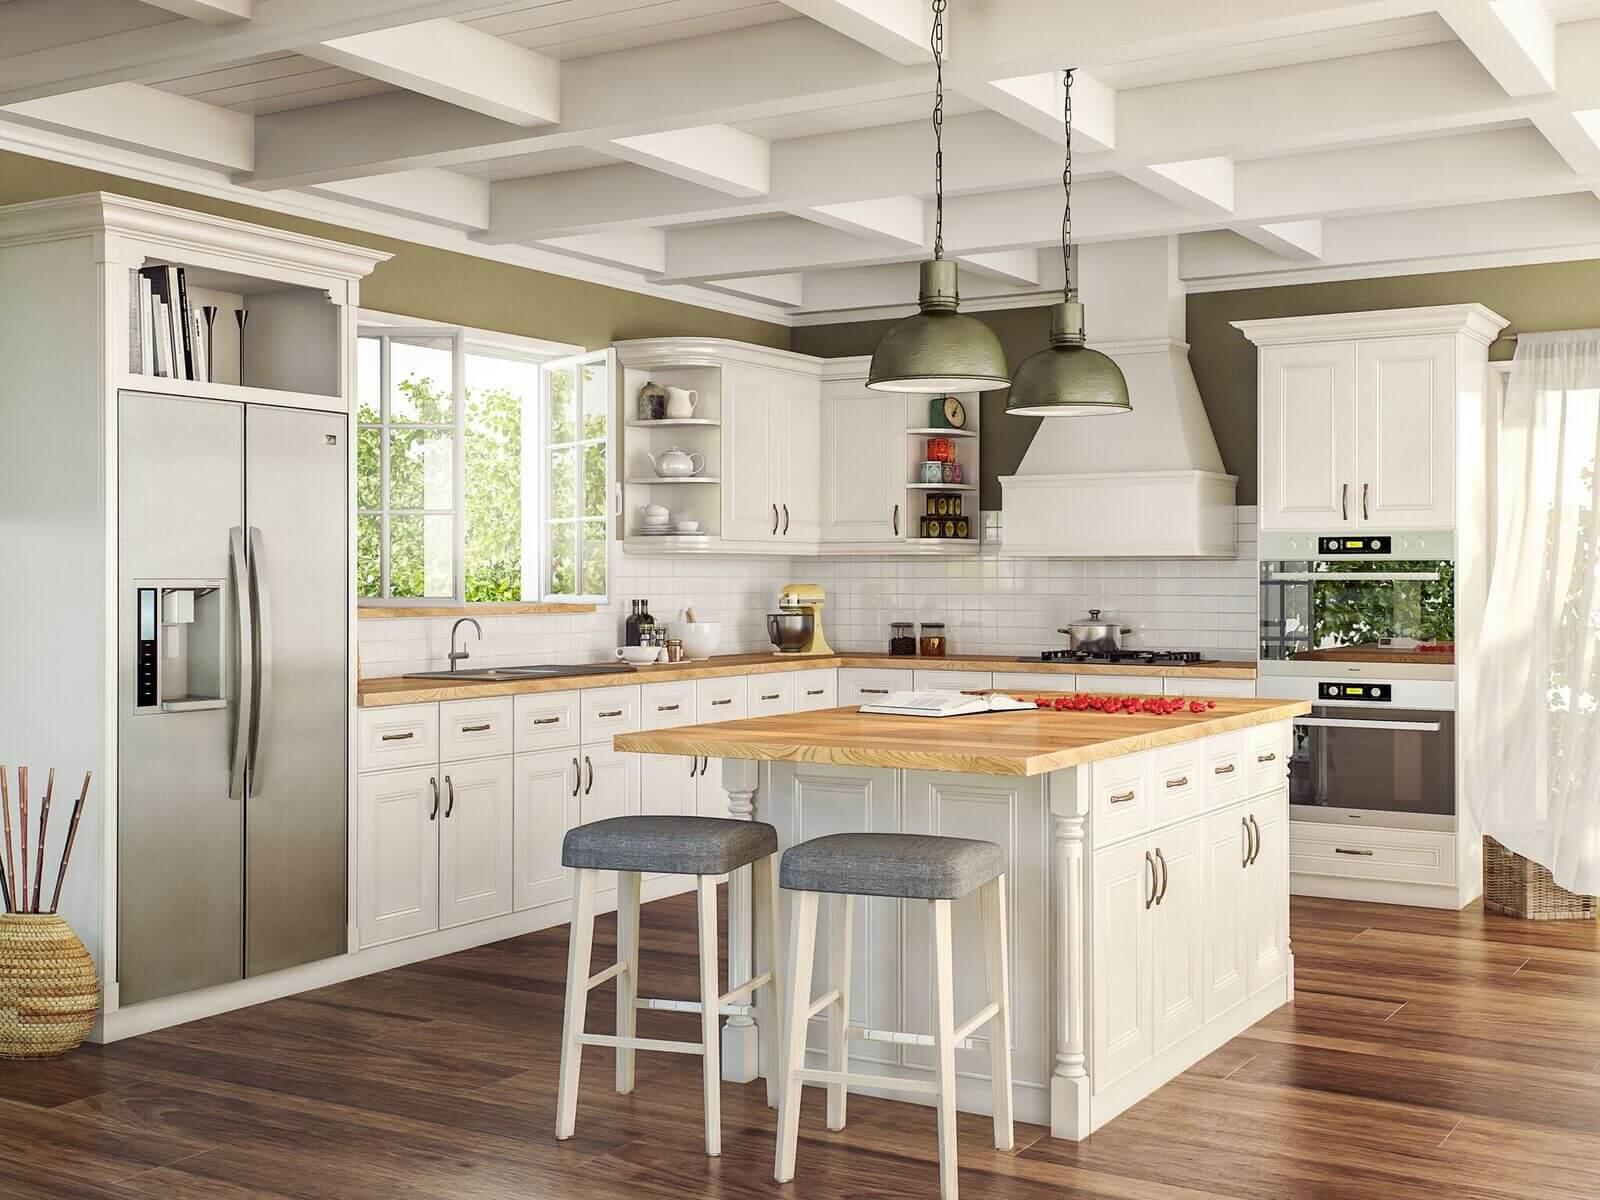 Alexandria pearl - kitchen-wholesalers-All Kitchens-cabinets